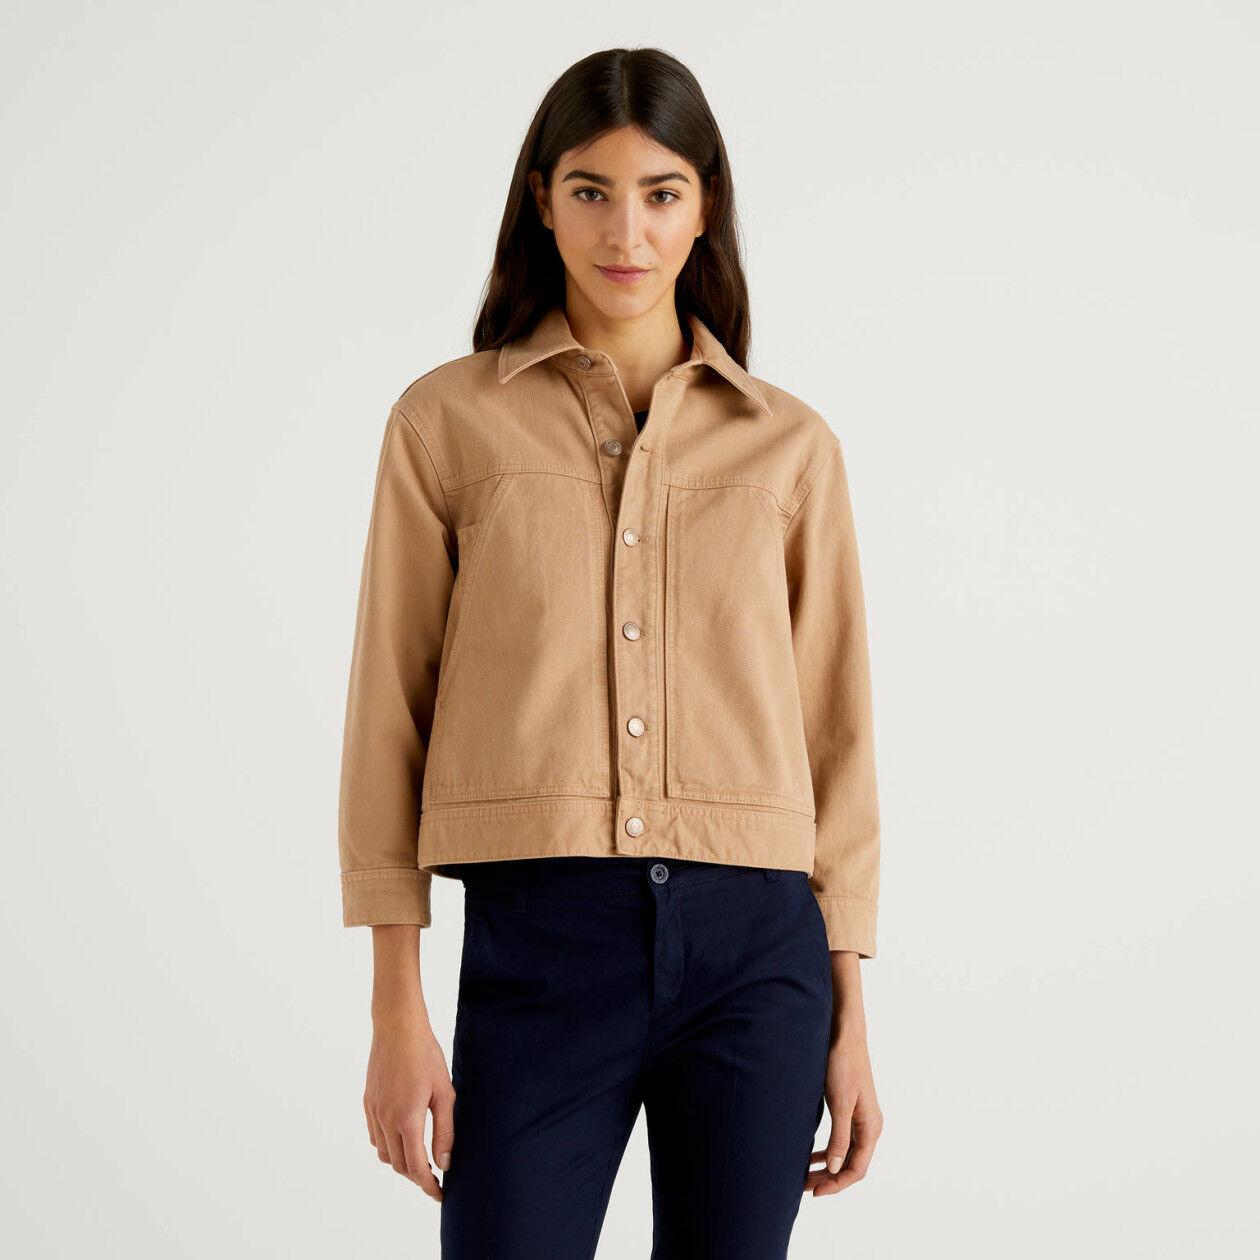 100% cotton jacket